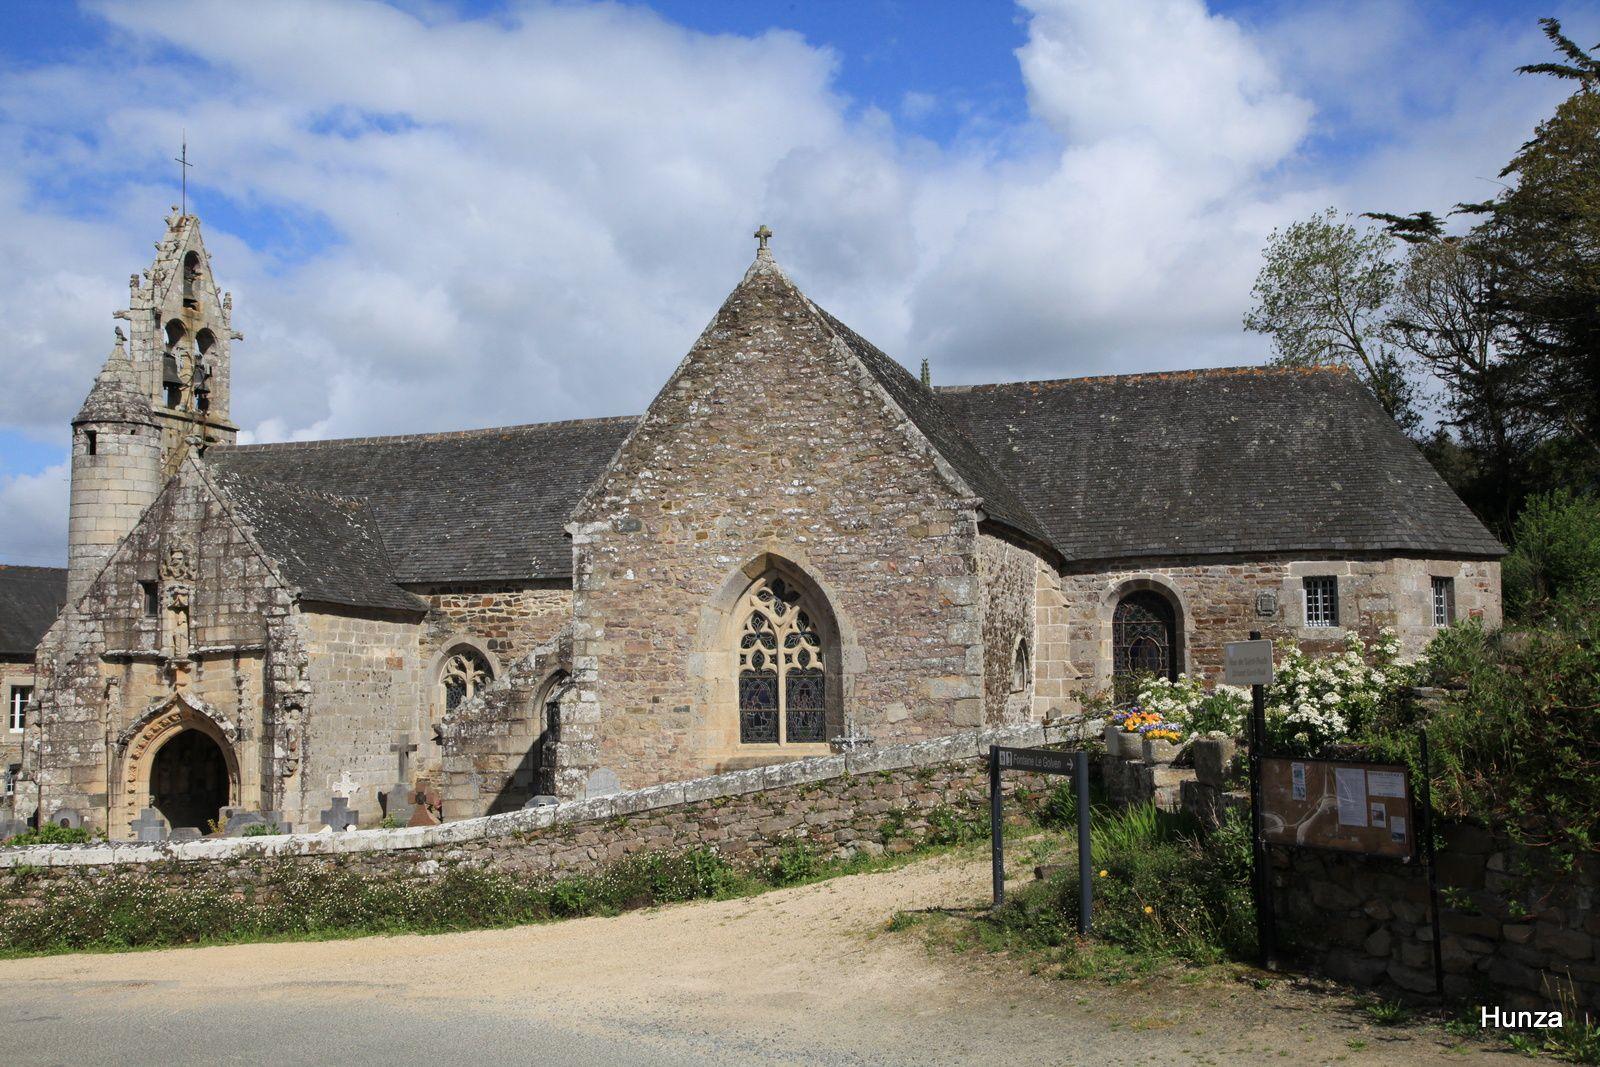 L'église Saint-Loup de Lanloup